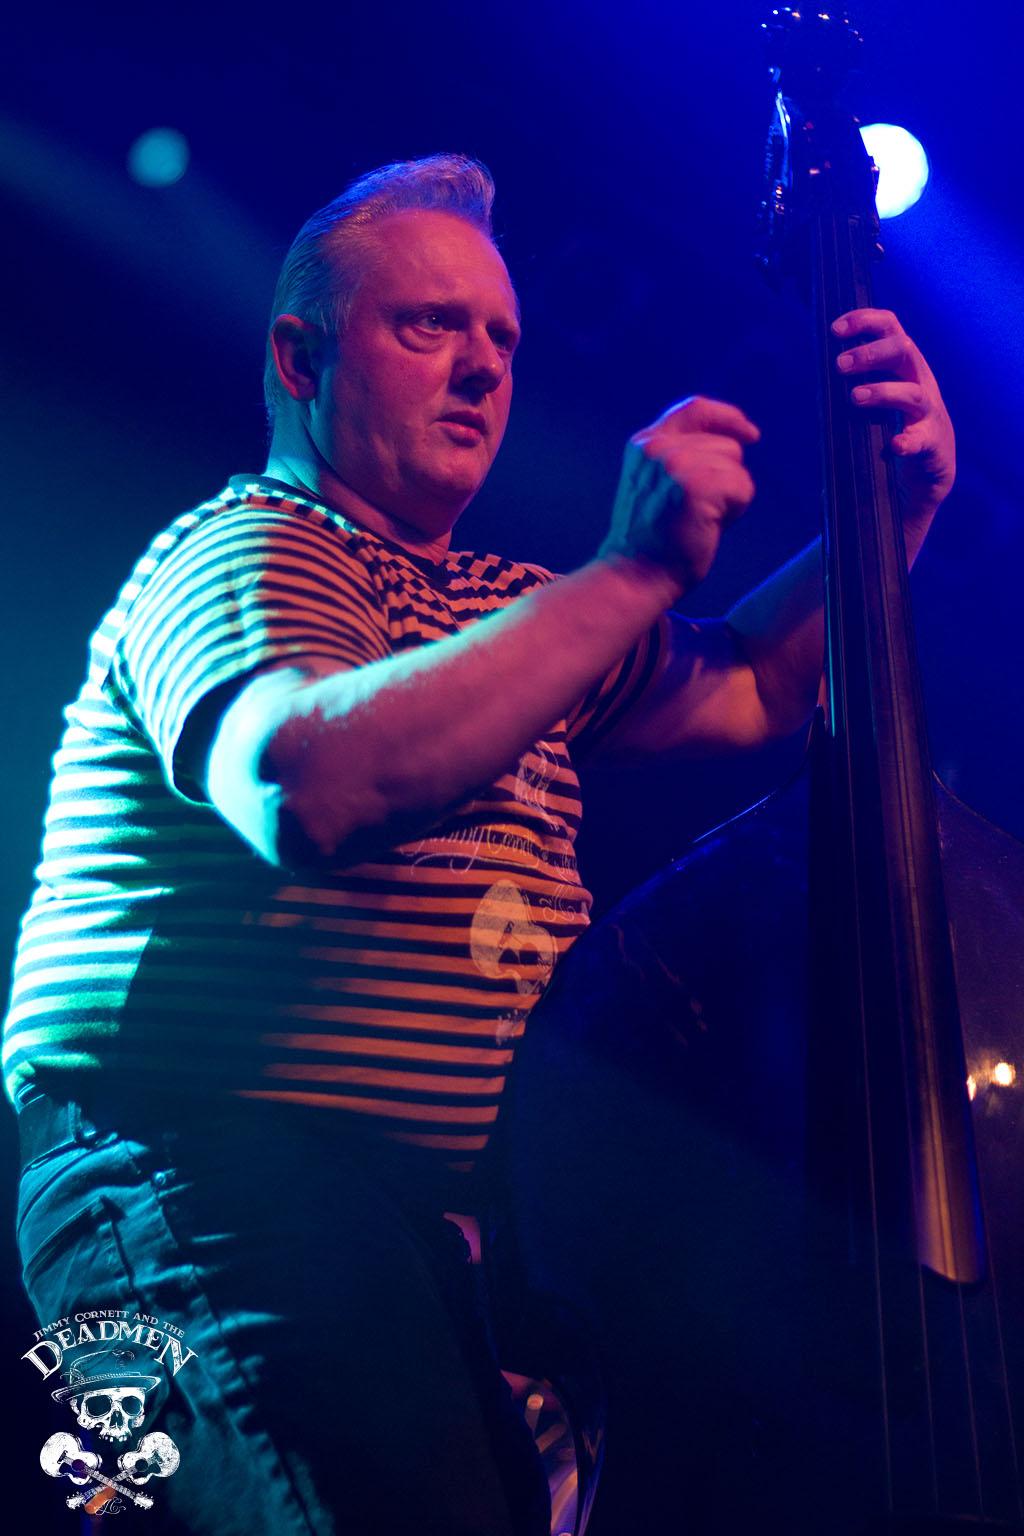 "Frank Jäger beim Konzert ""Jimmy Cornett and the Deadmen"" in Hamburg, Markthalle am 04.10.2019. Fotos: Daniela Stelter"